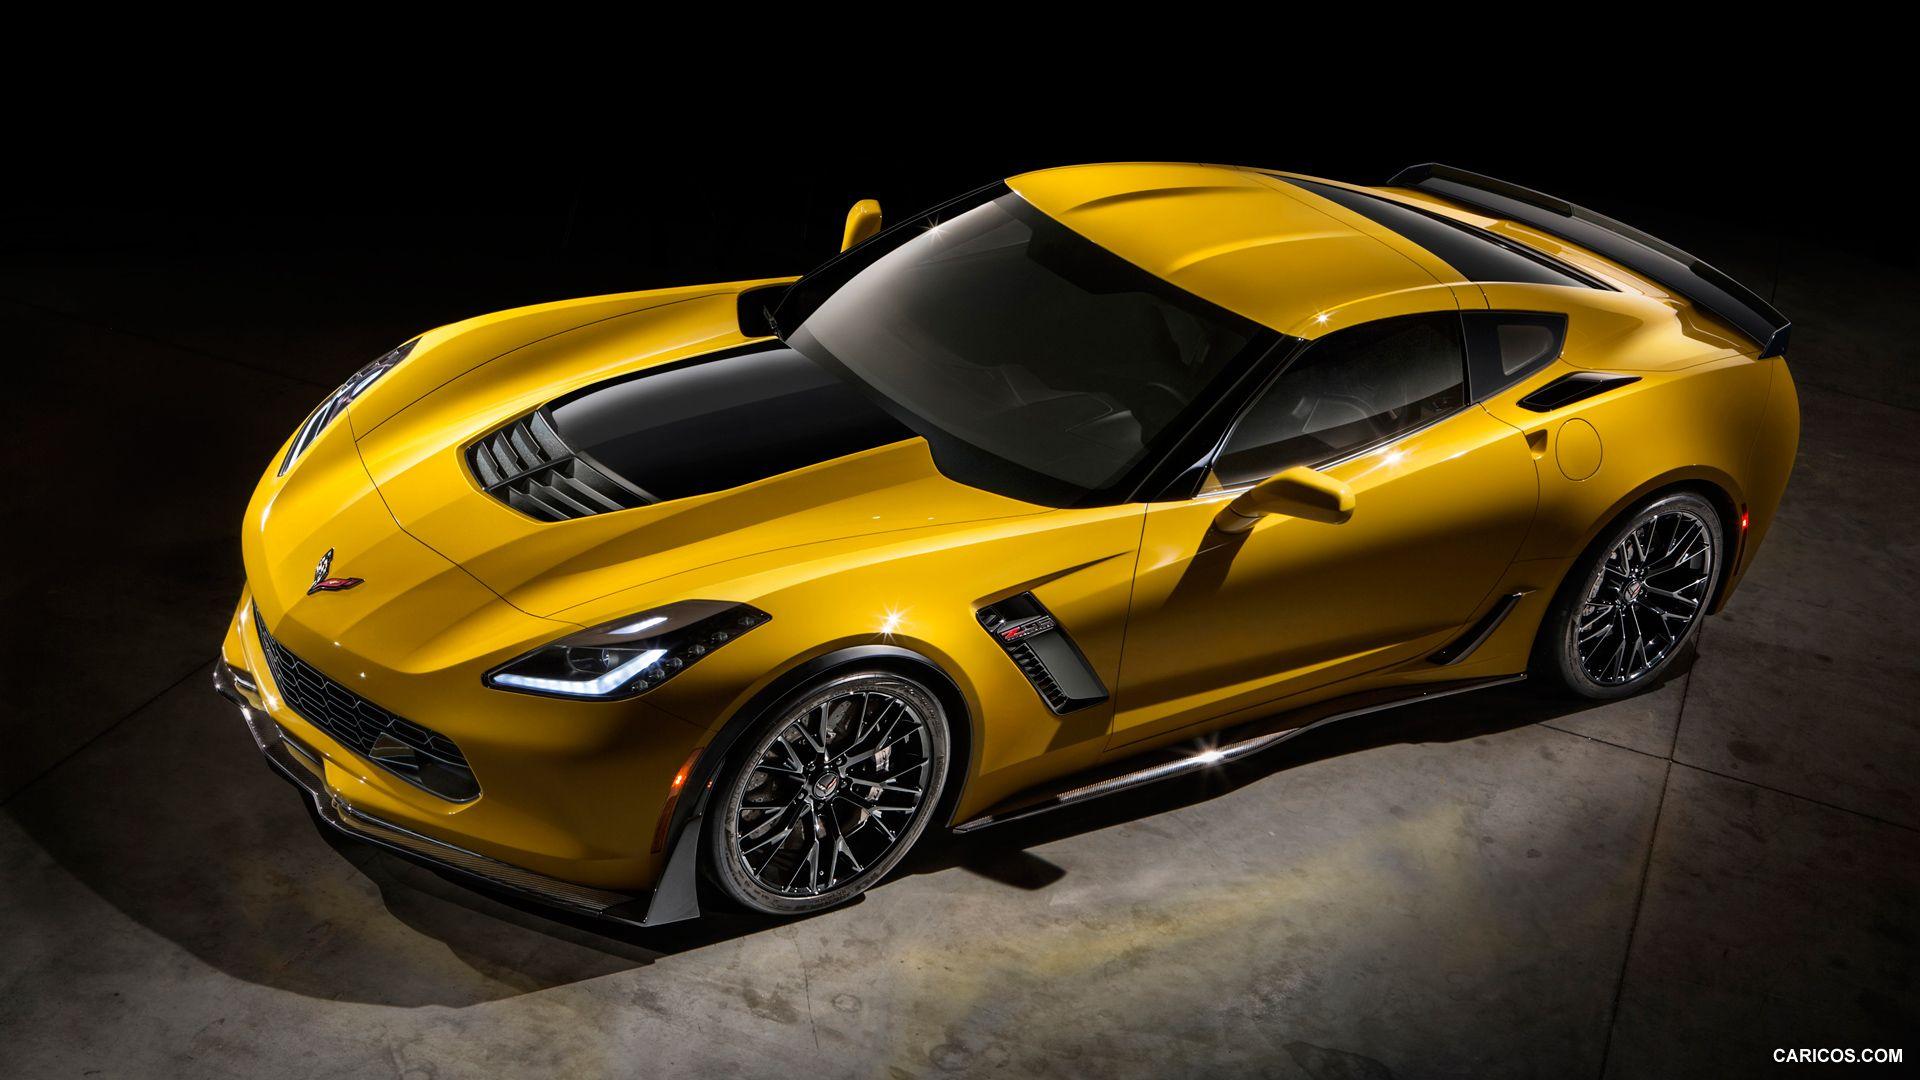 2015 Chevrolet Corvette Z06 Chevrolet Corvette Z06 Chevrolet